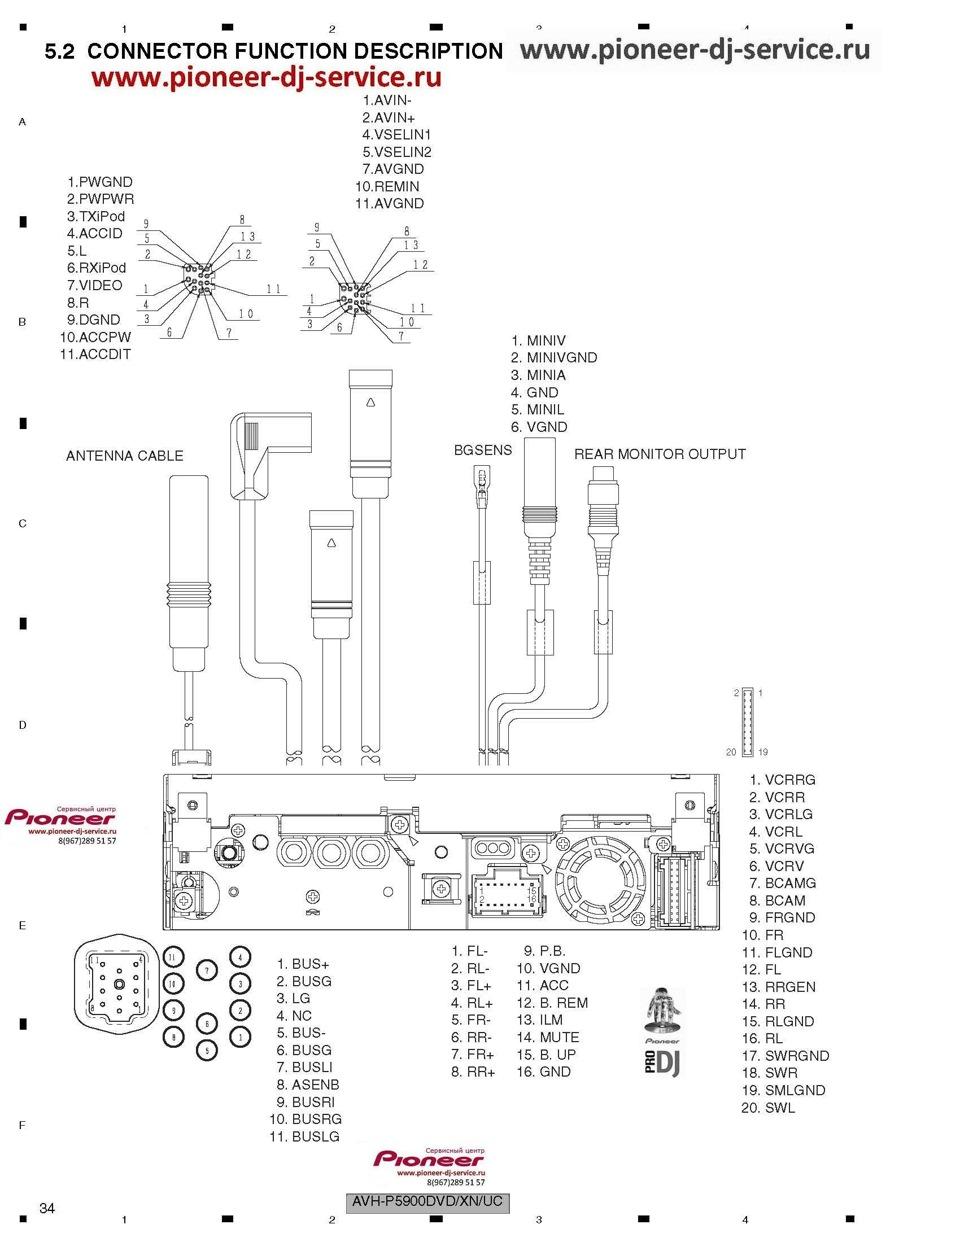 Sony 7800 схема подключения